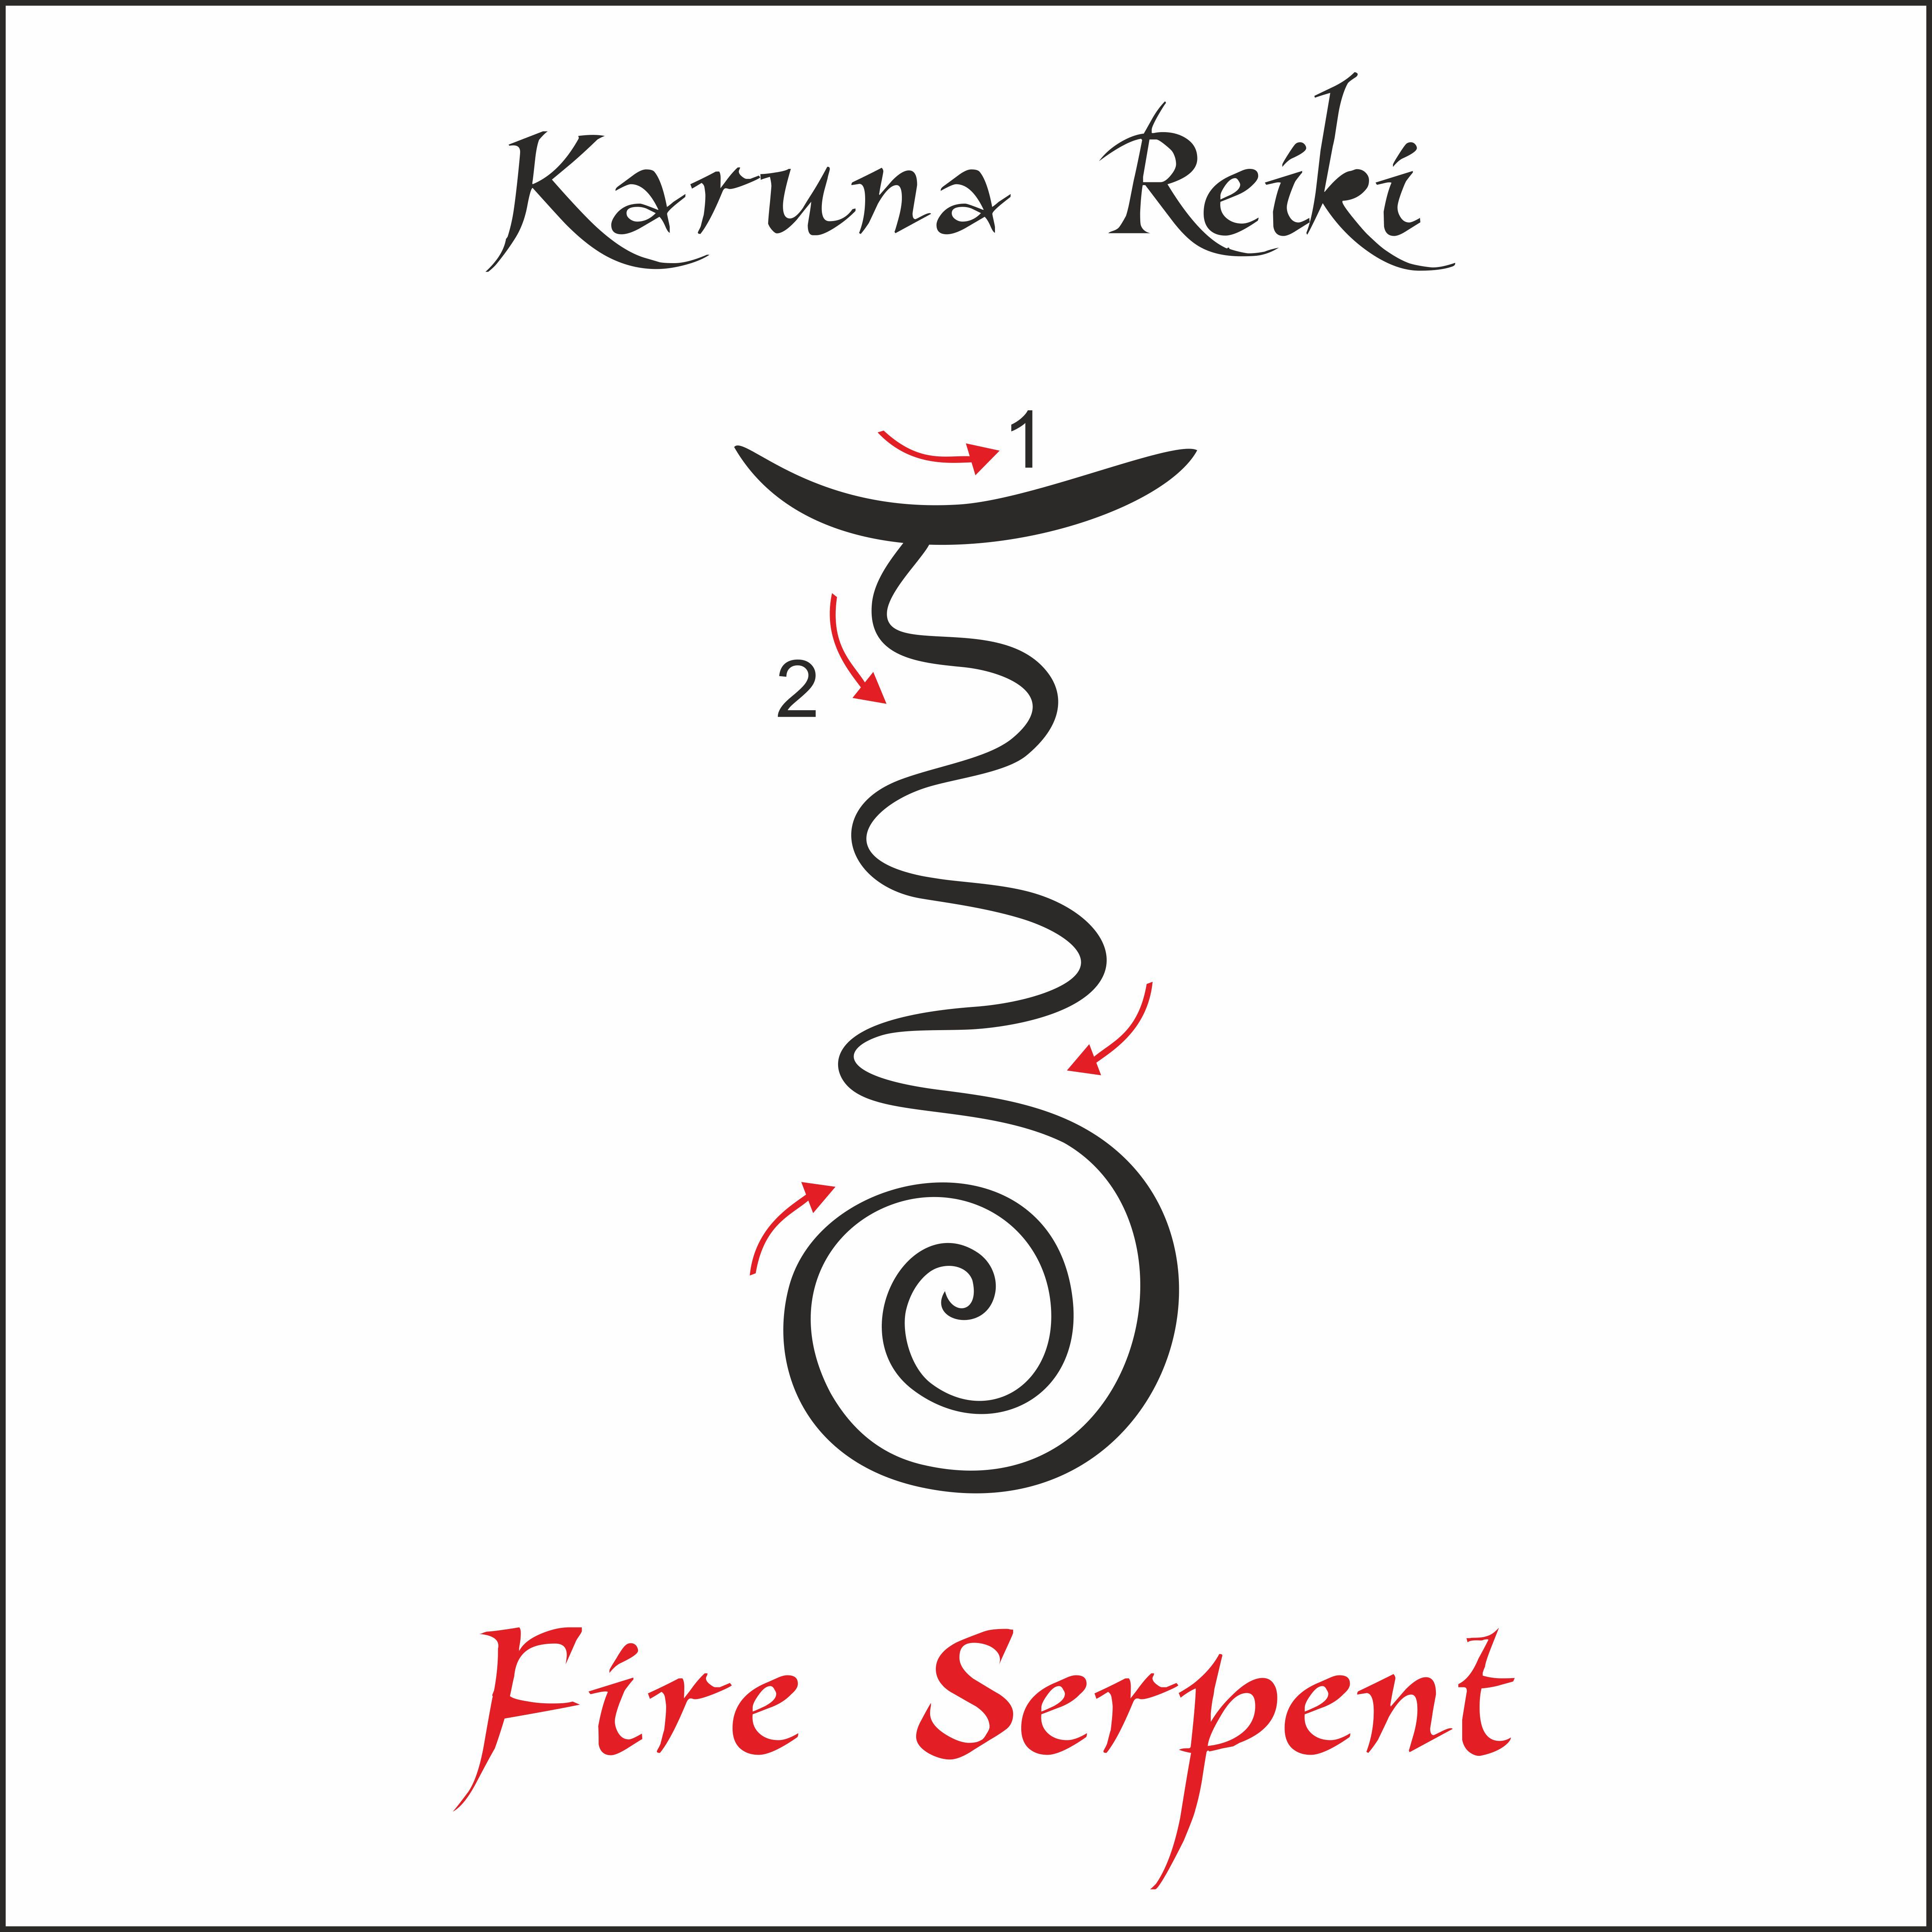 Karuna Reiki. Energy healing. Alternative medicine. Fire